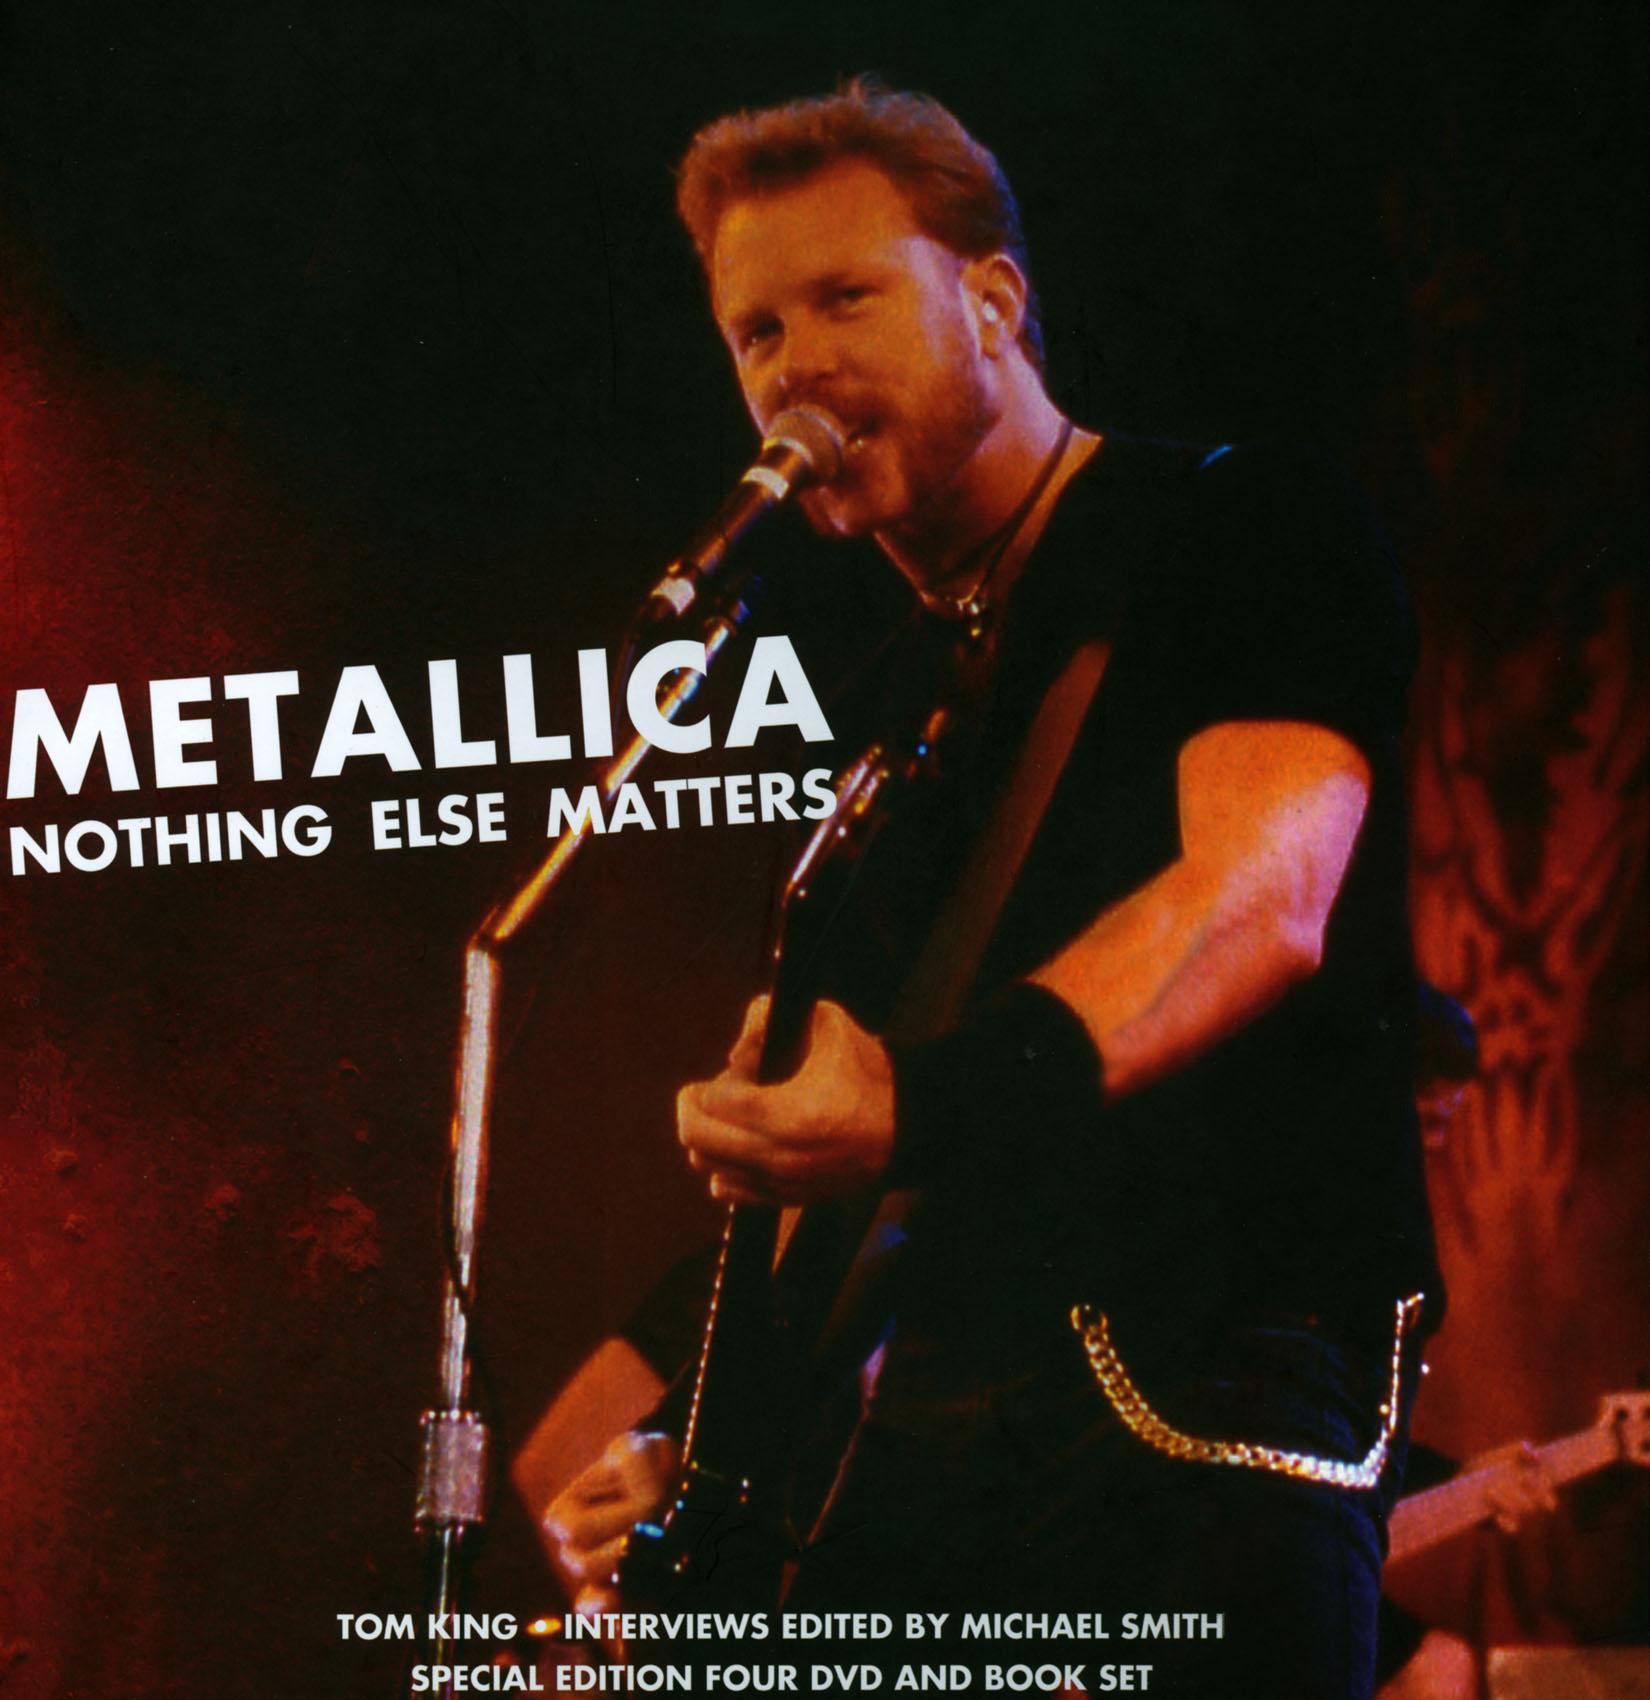 Metallica: Nothing Else Matters